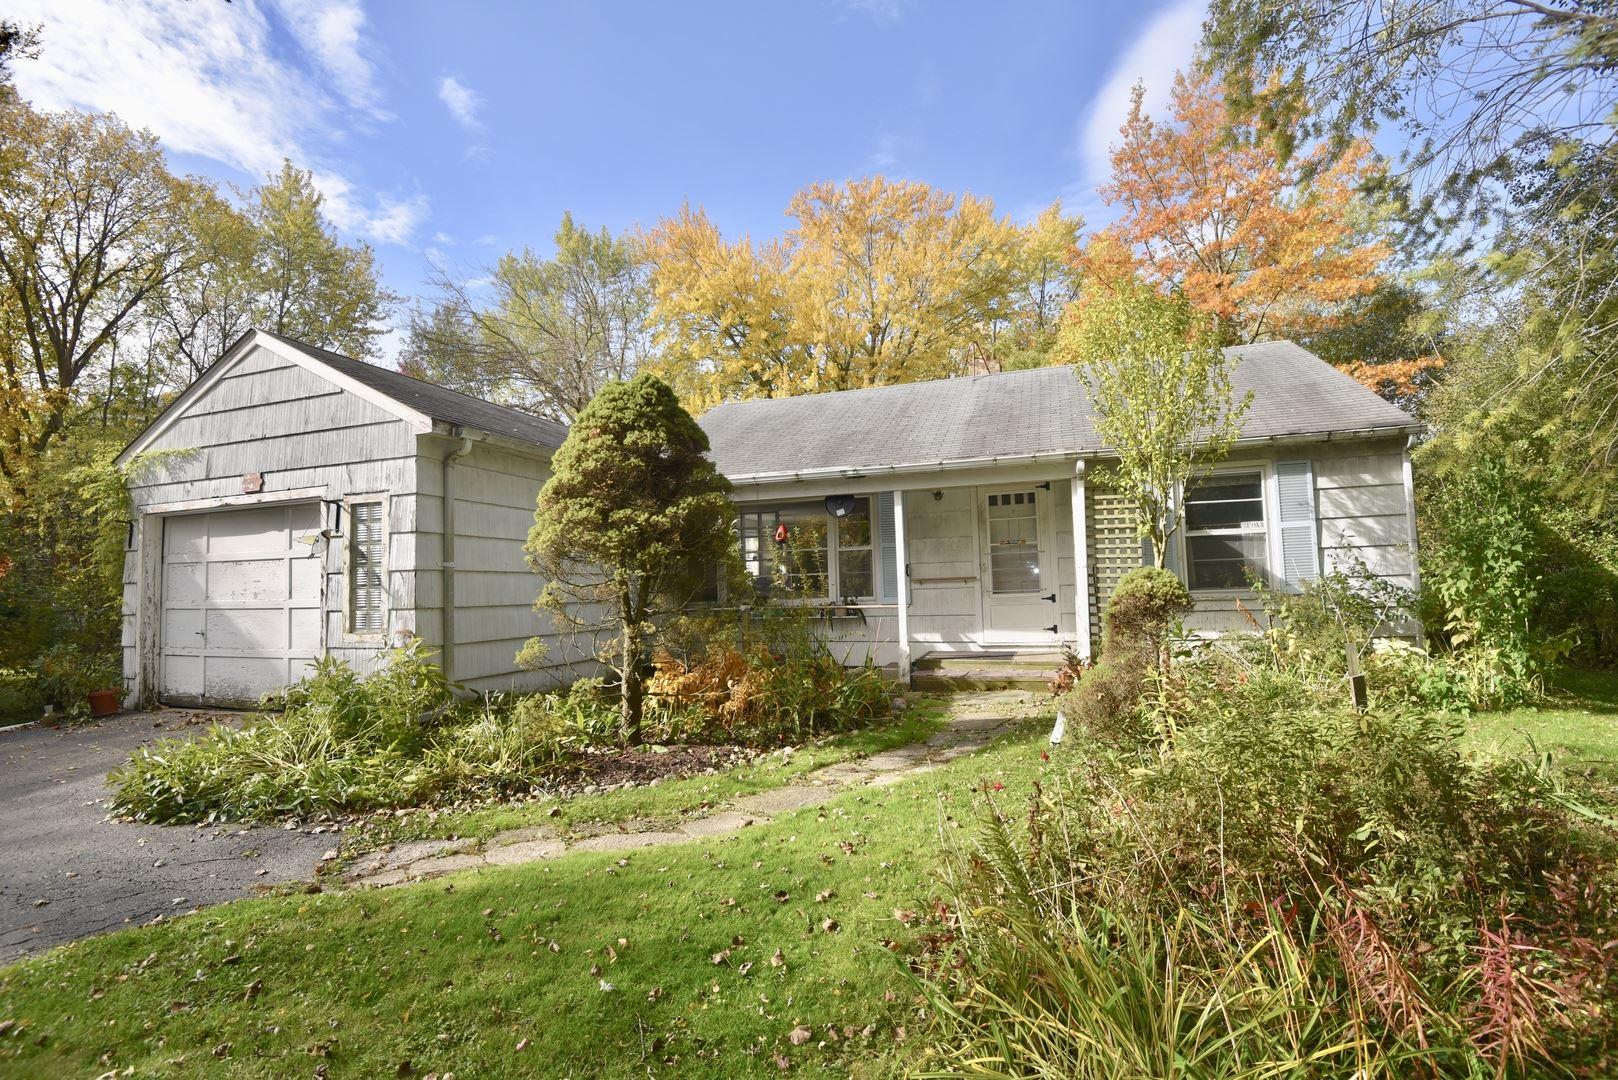 1890 Spruce Street, Highland Park, IL 60035 - MLS#: 10768964